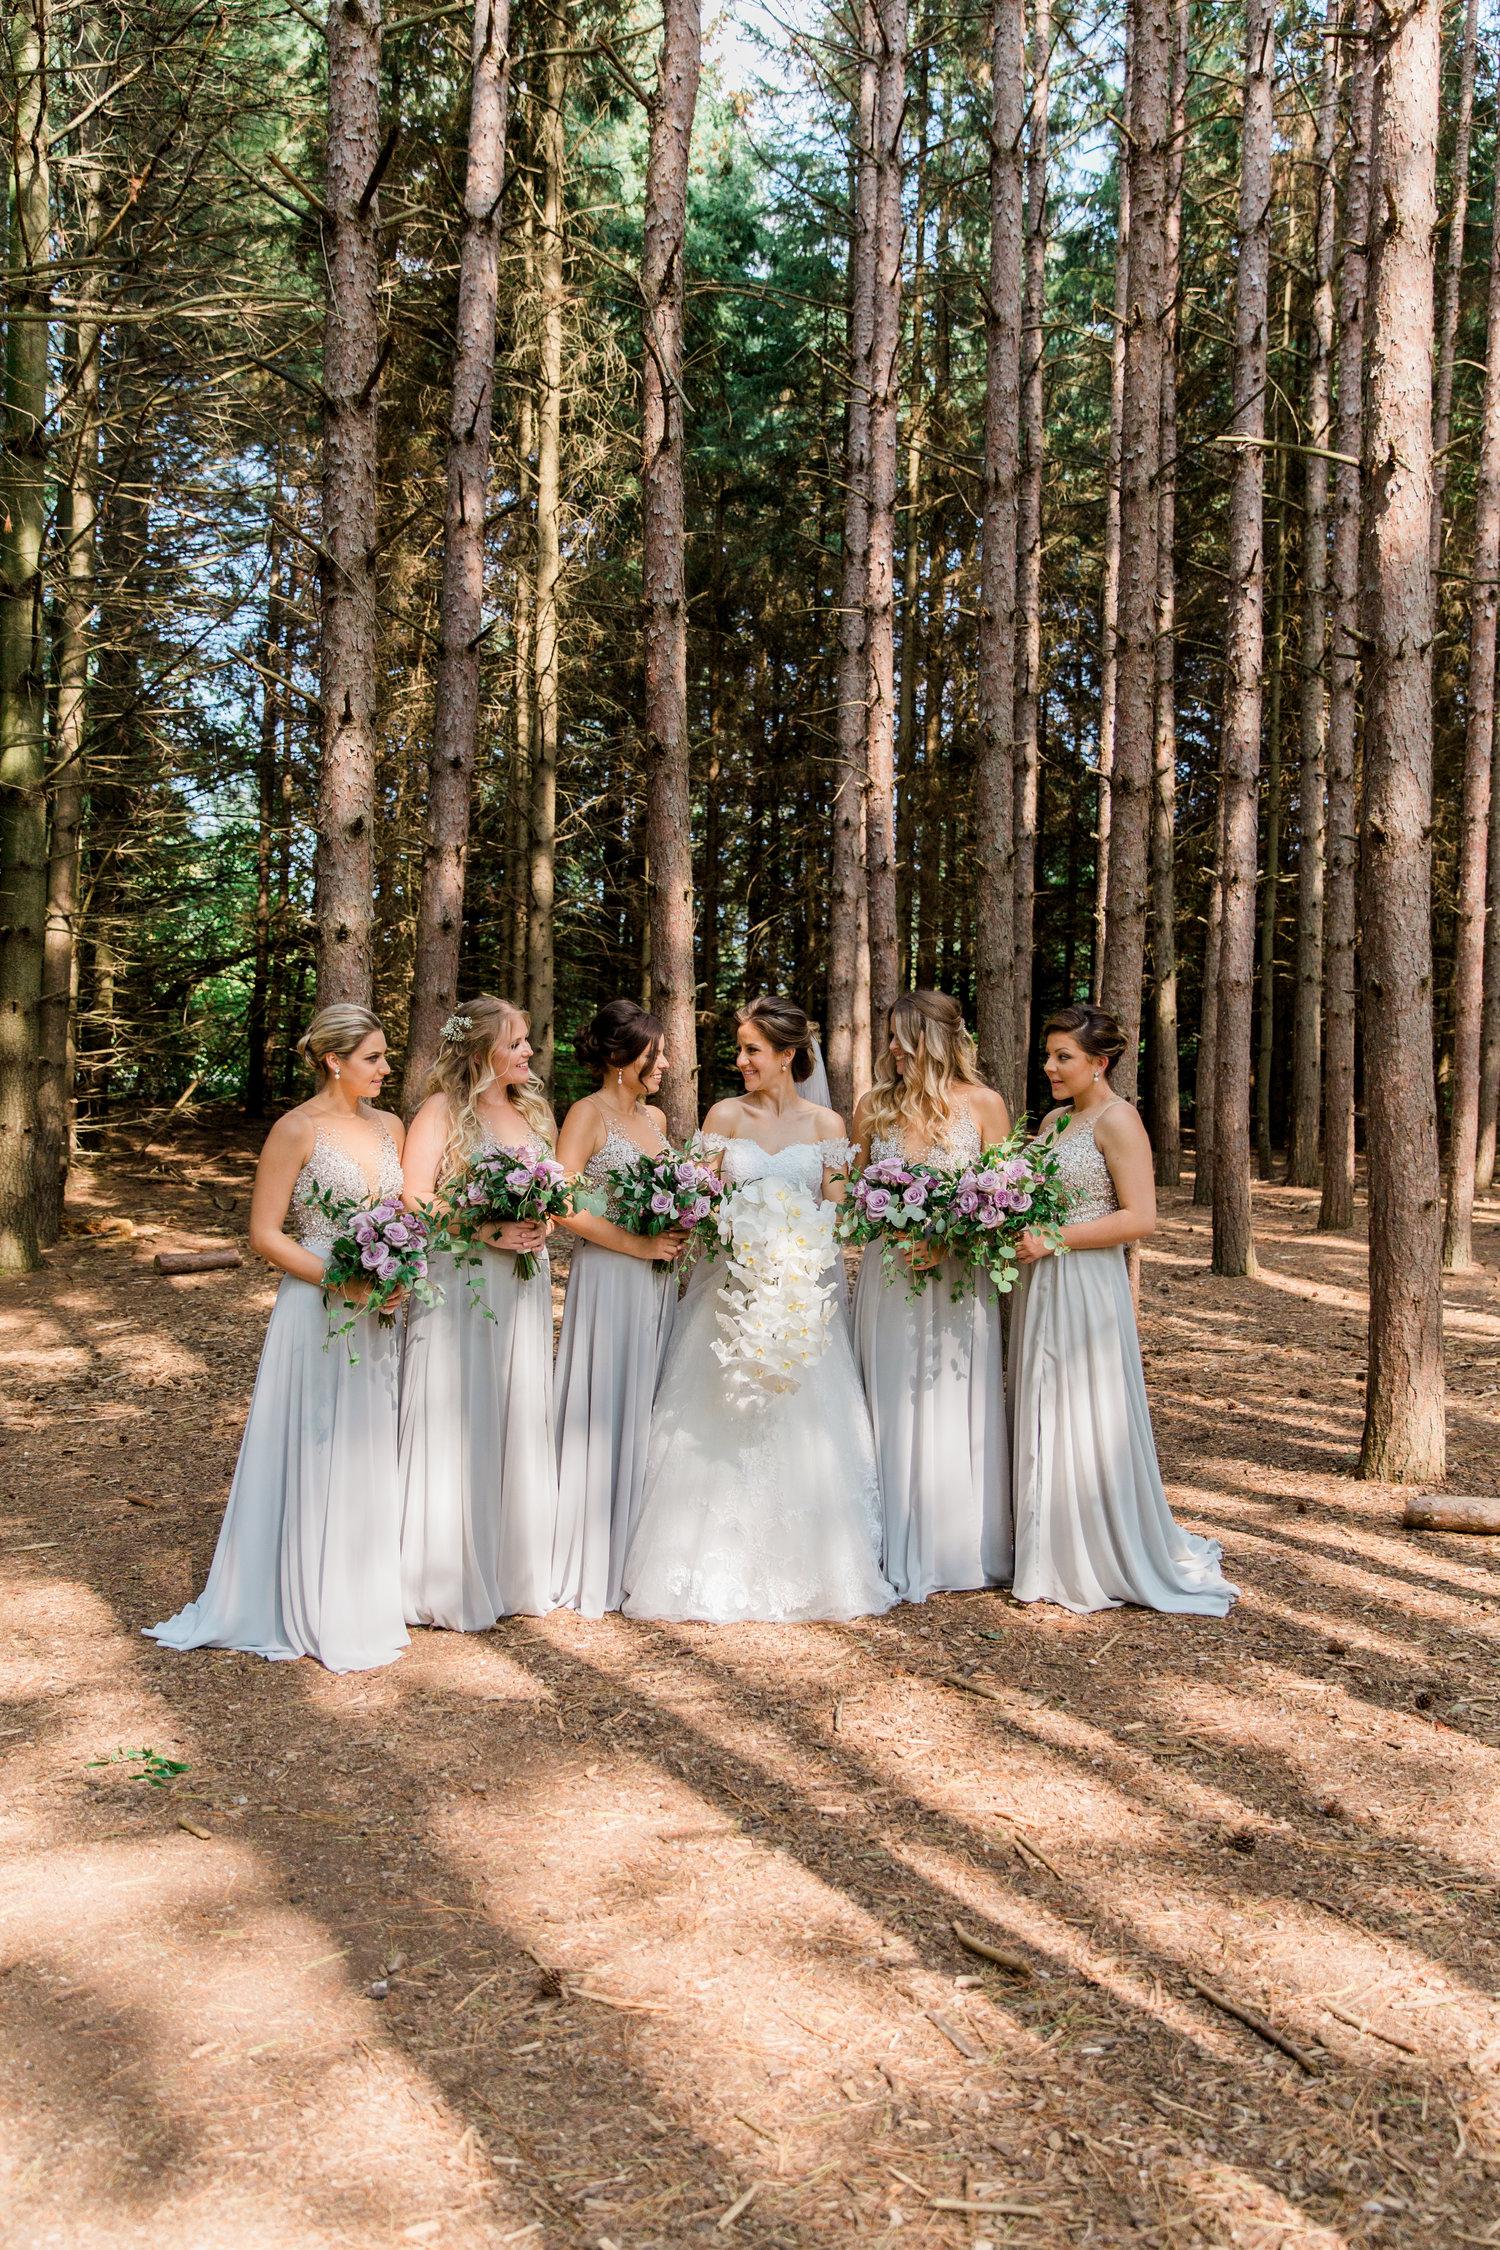 Danielle-Giroux-Amir-Golbazi-Toronto-Wedding-Photographer-Bellvue-Manor_DeLuca_1-606.jpg